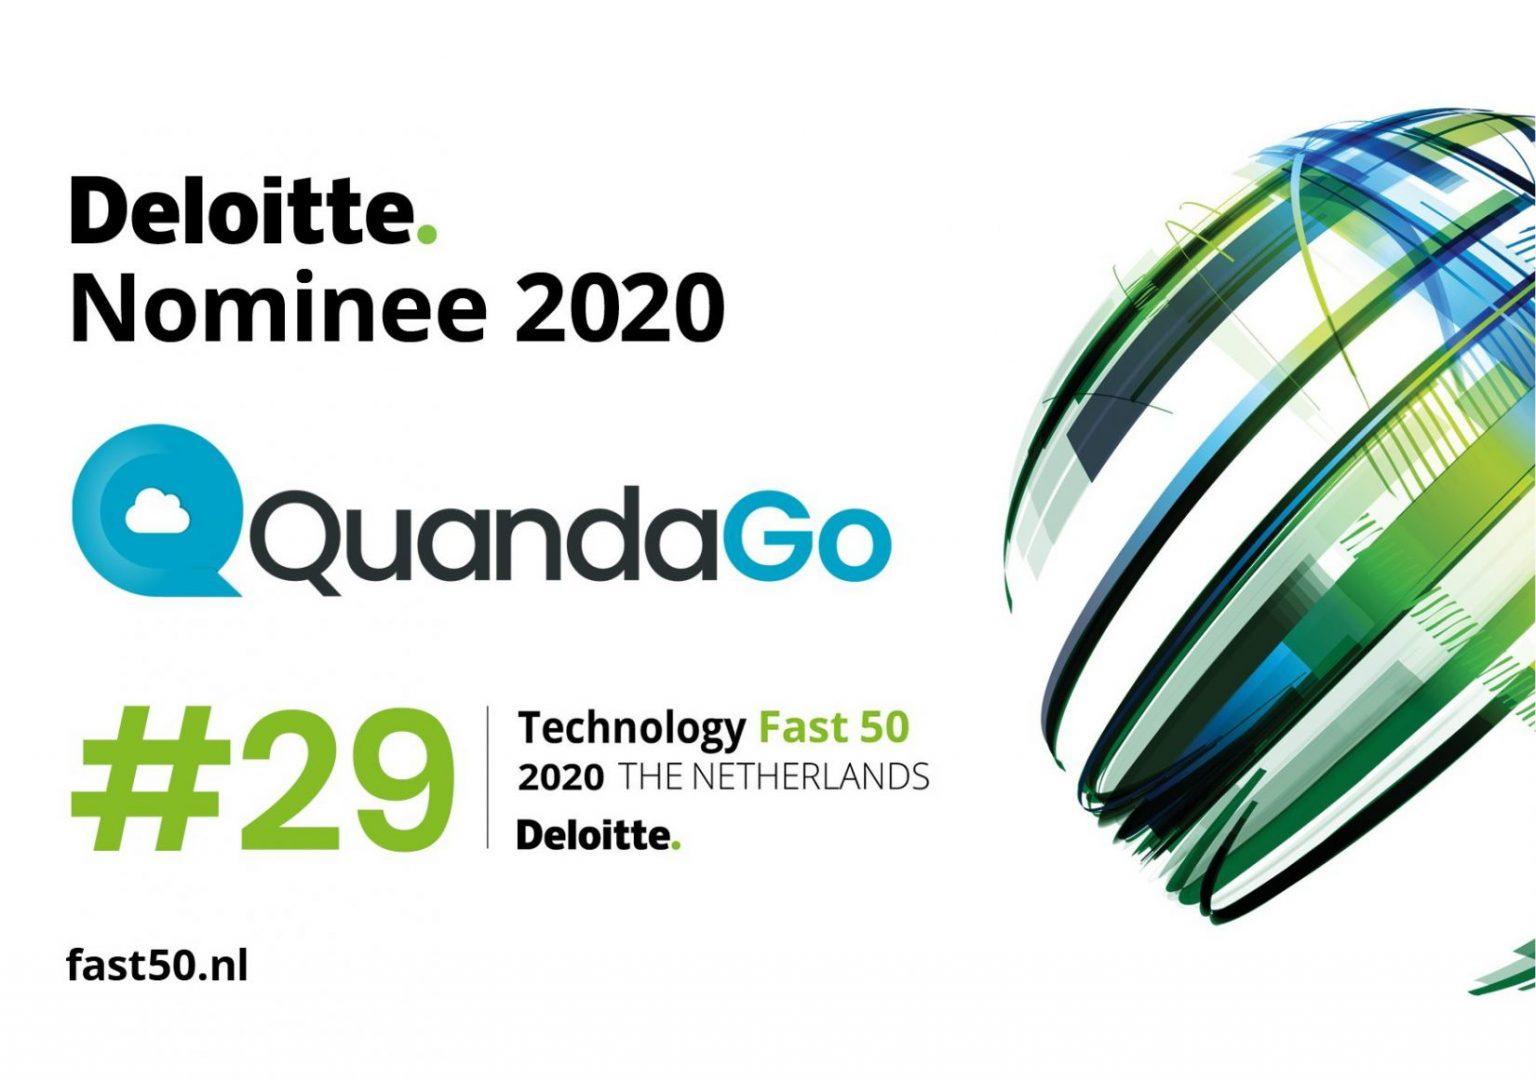 QuandaGo Deloitte Technology Fast 50